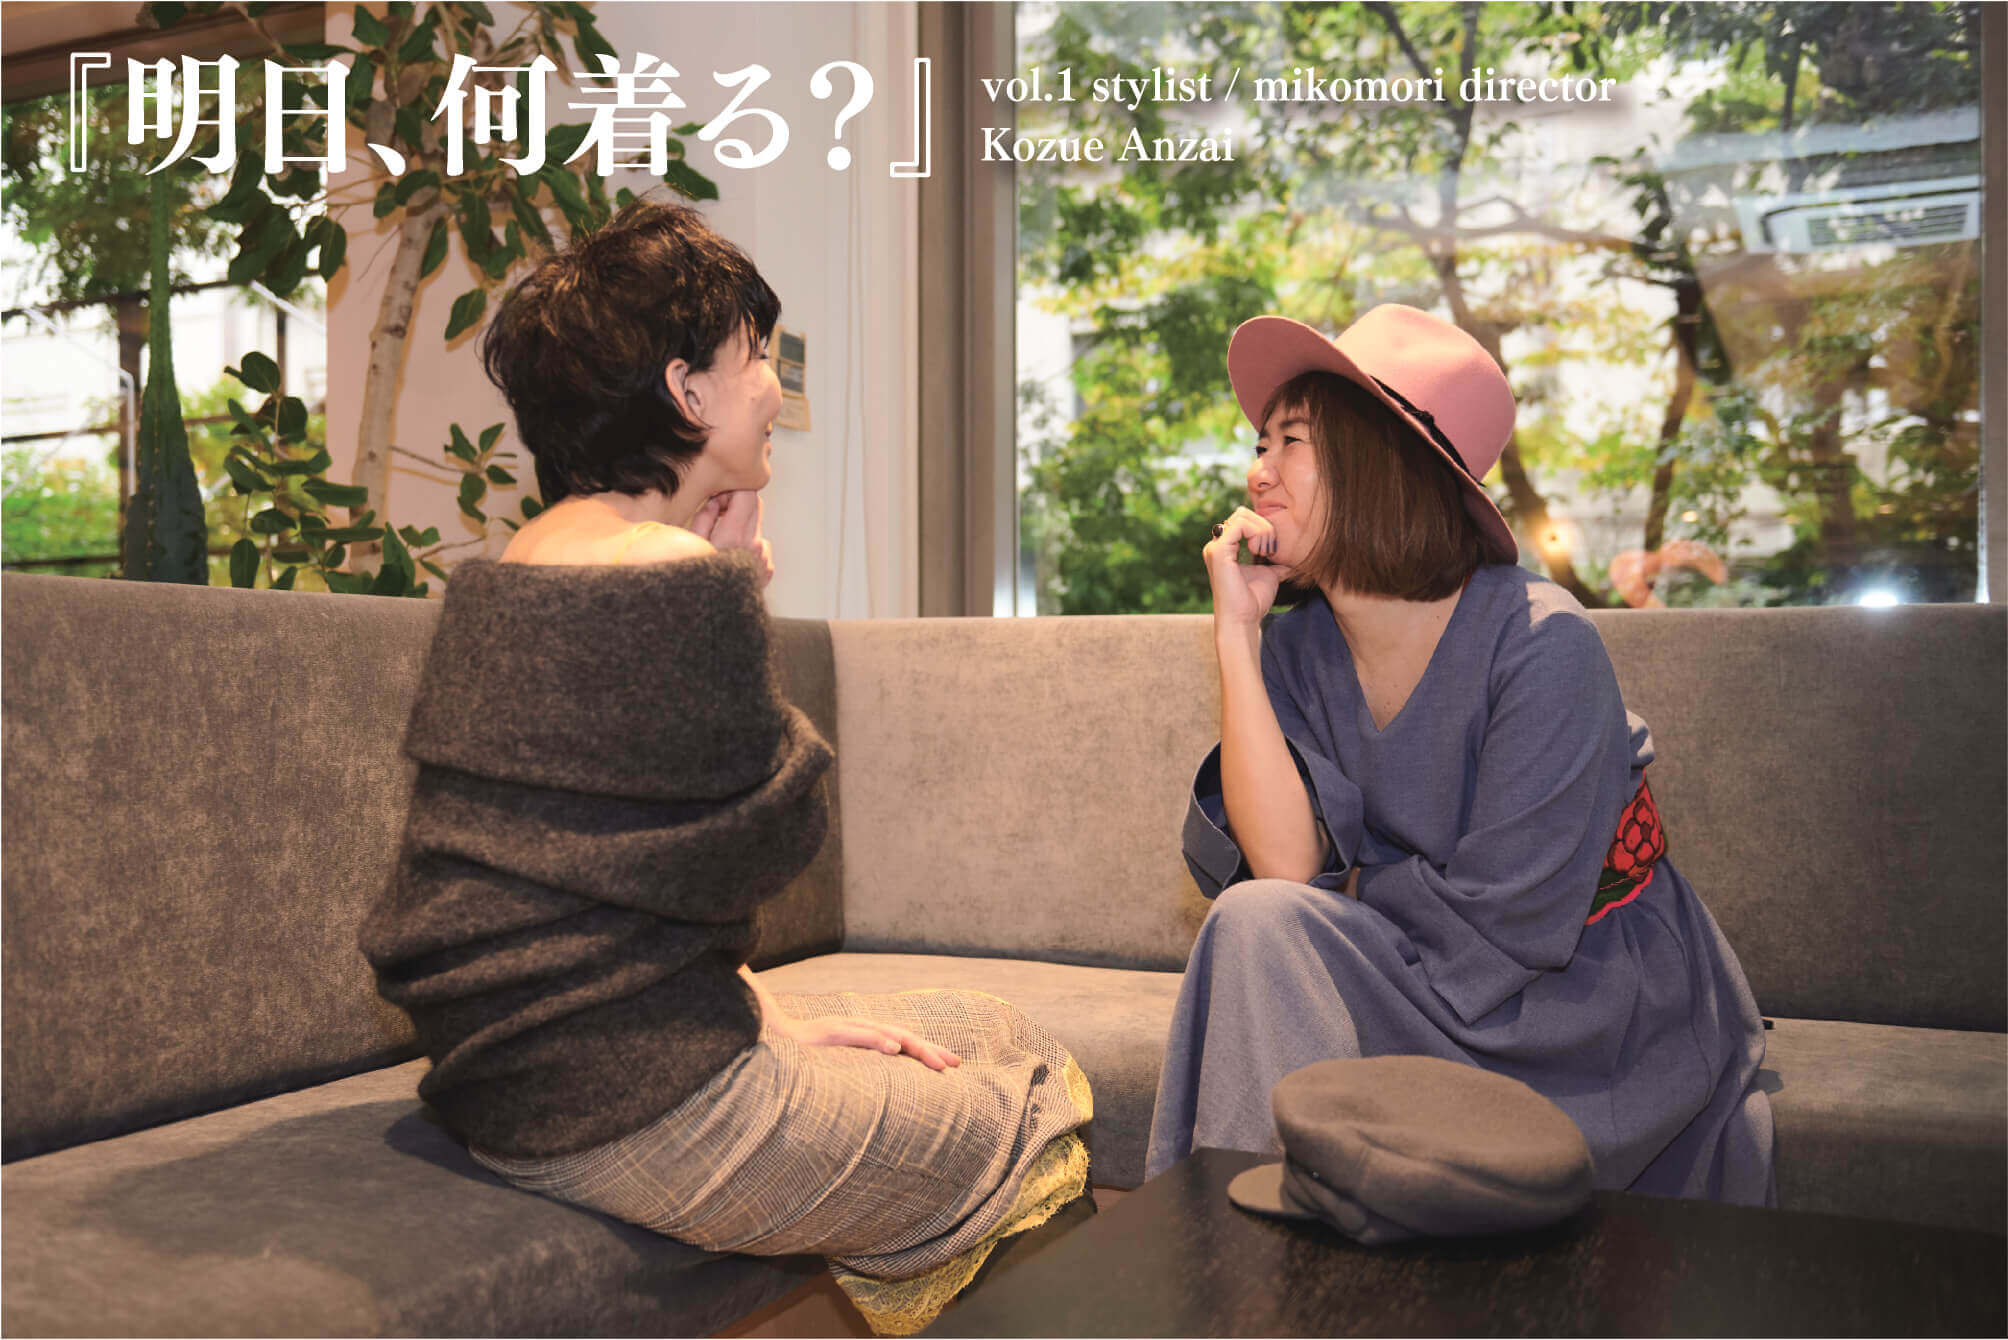 『明日、何着る?』vol.1 stylist / mikomori director Kozue Anzai